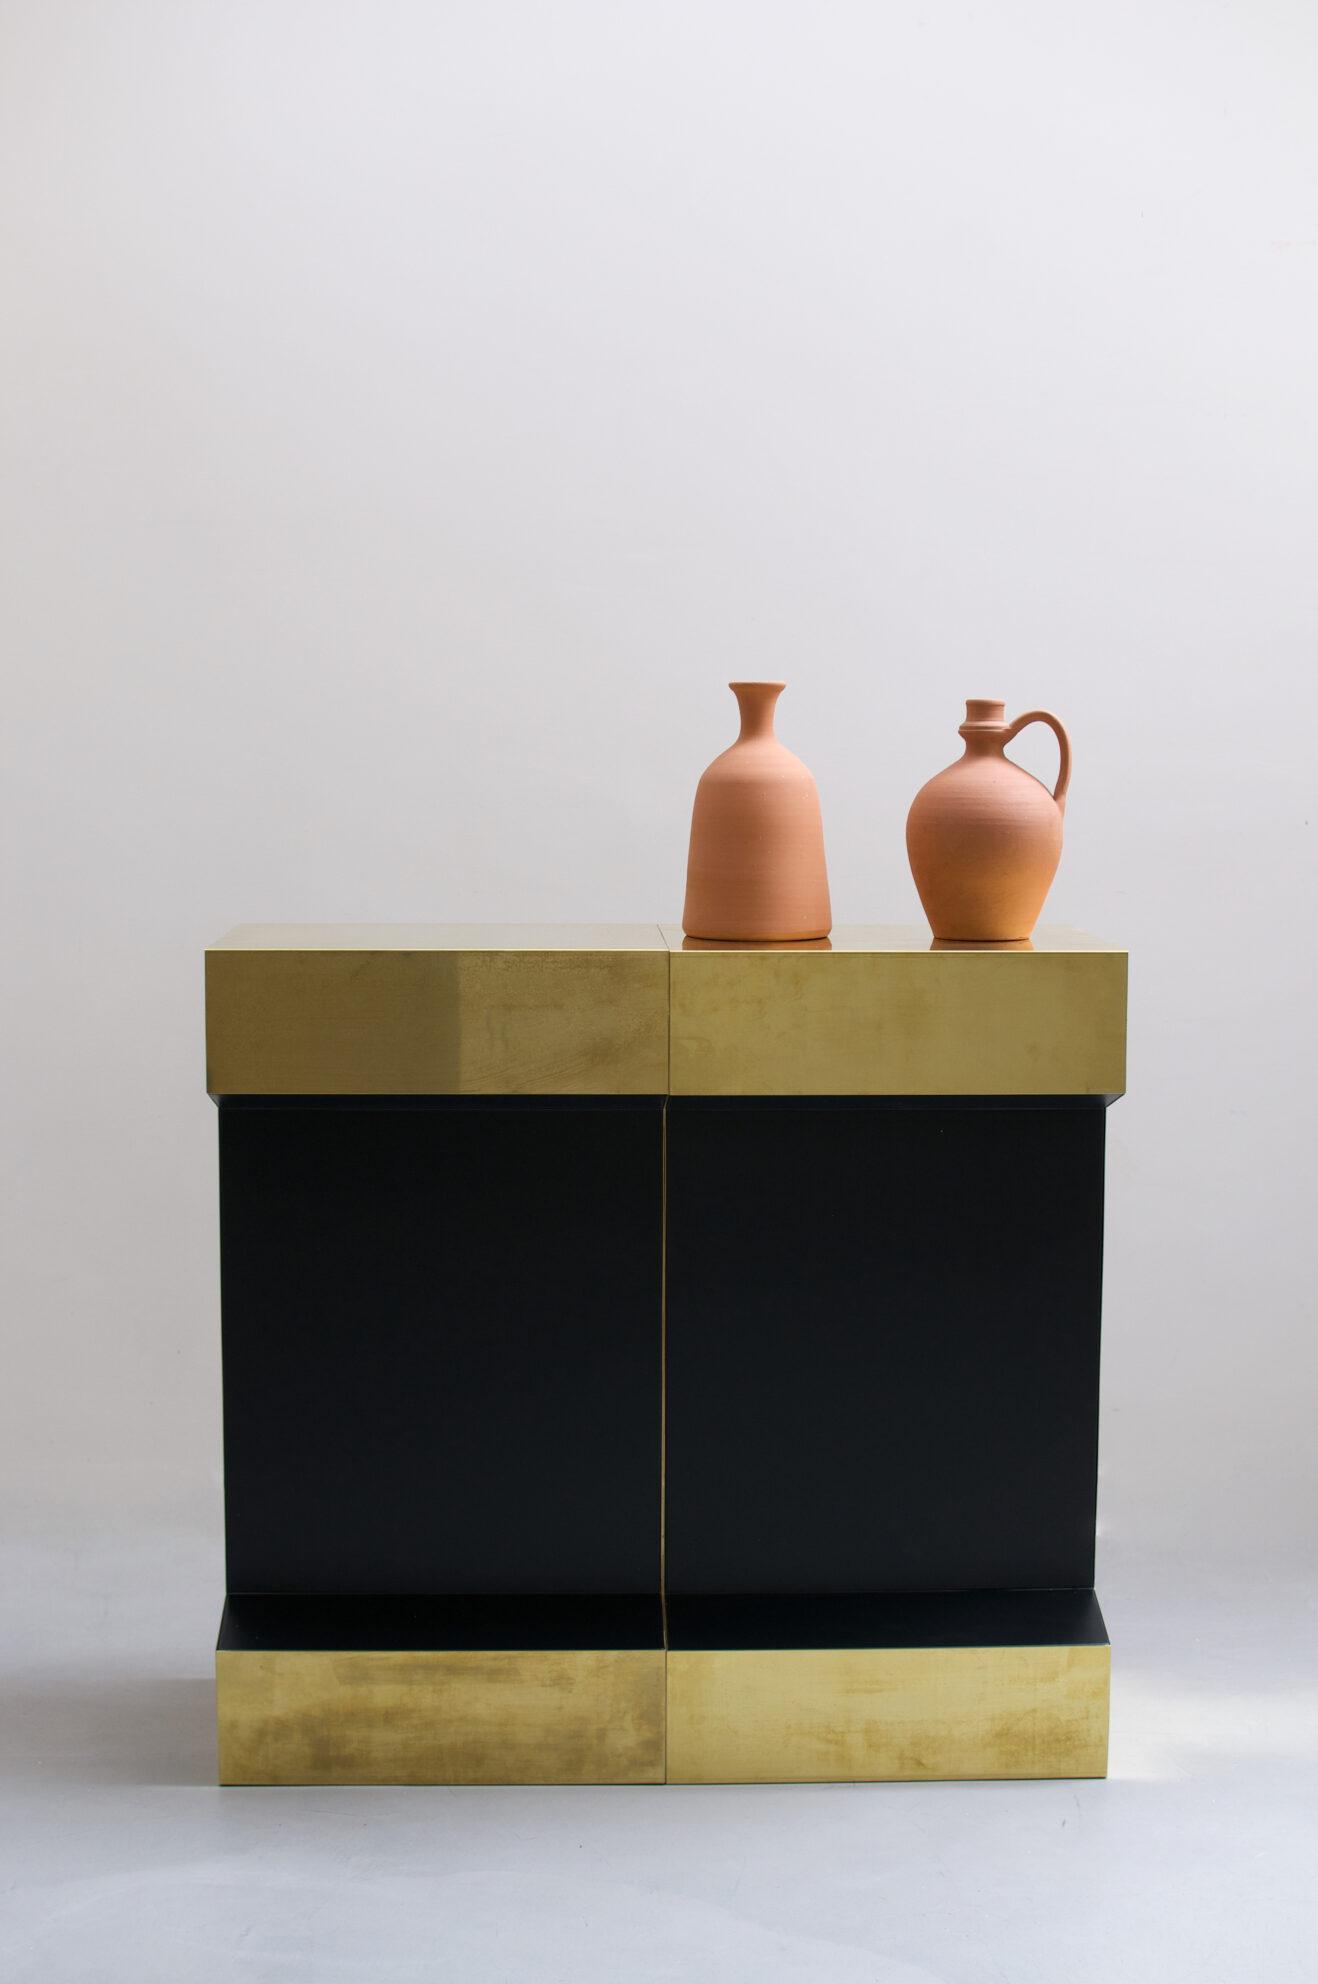 RAILS 750 'Brass' by Gwendoline Porte (+ colors) 2